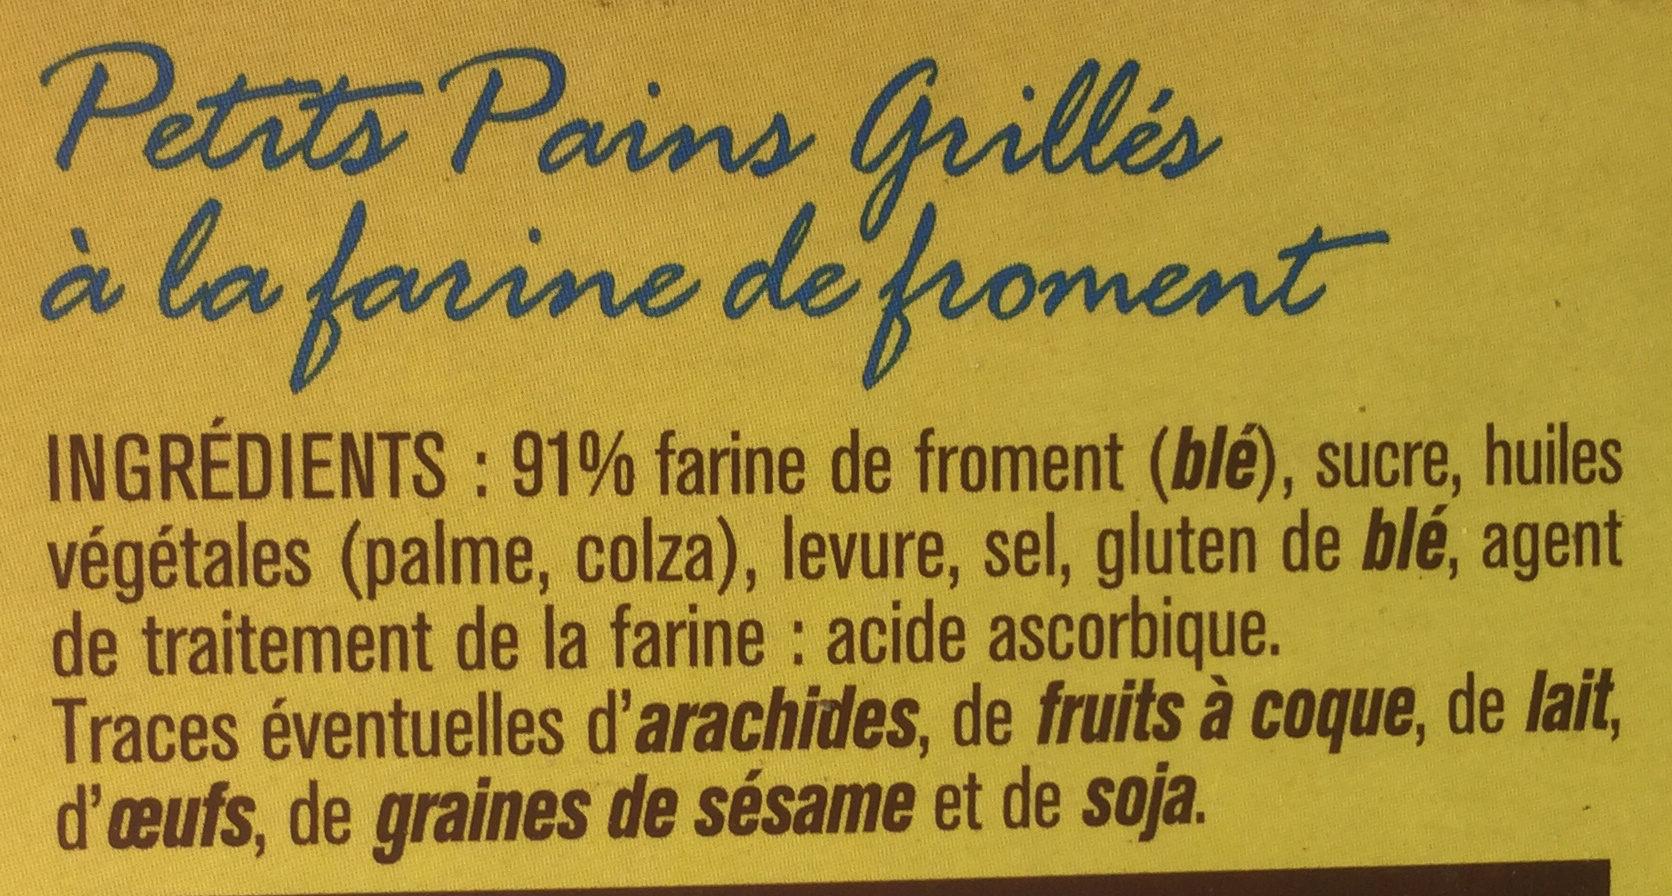 Petits pains grillés froment - Ingrediënten